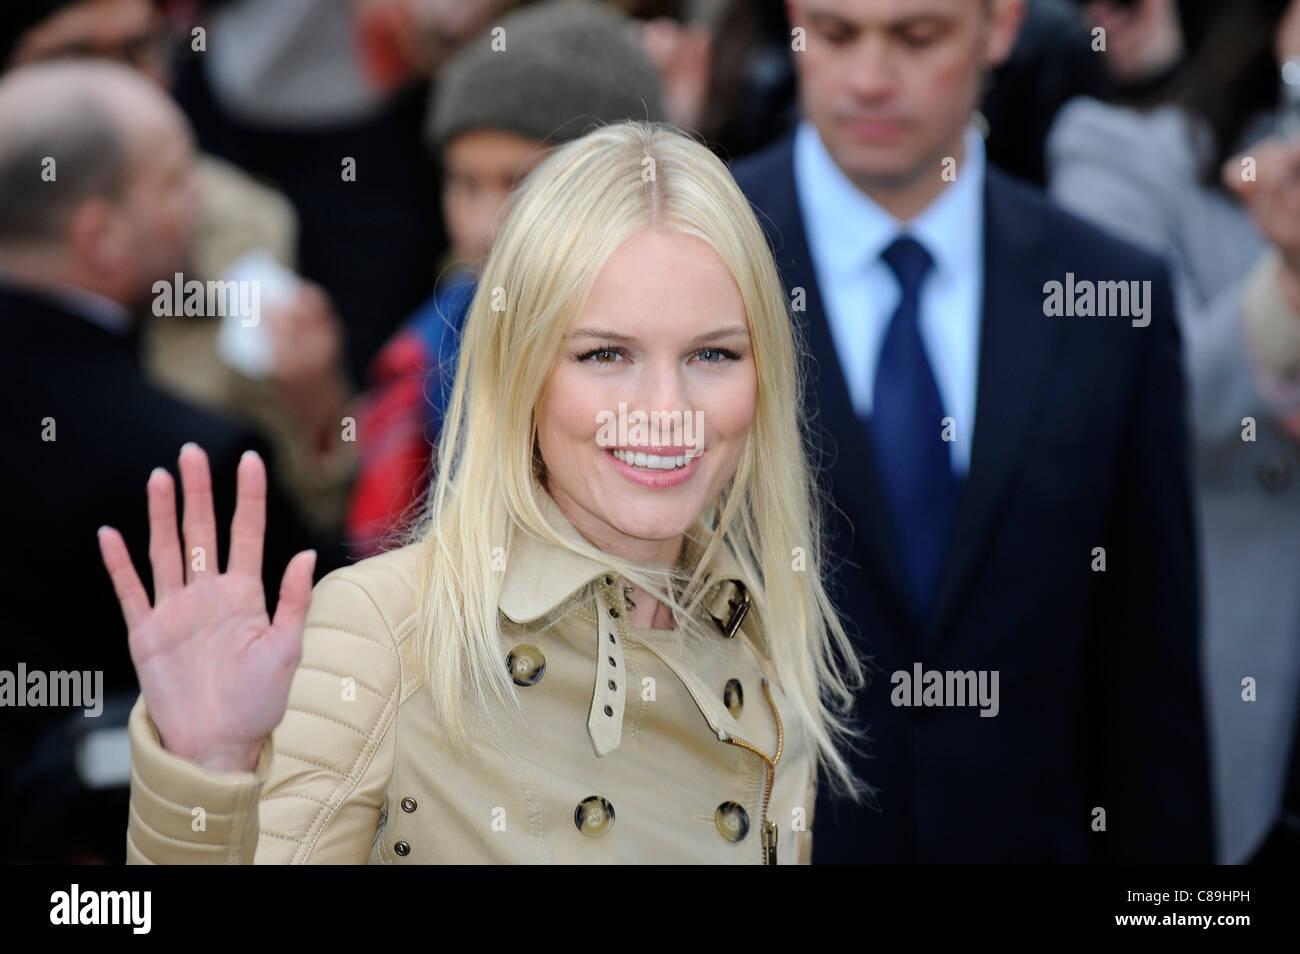 Kate Bosworth 2011 - Immagine Copyright Celebrity Spotlight 2011 Immagini Stock